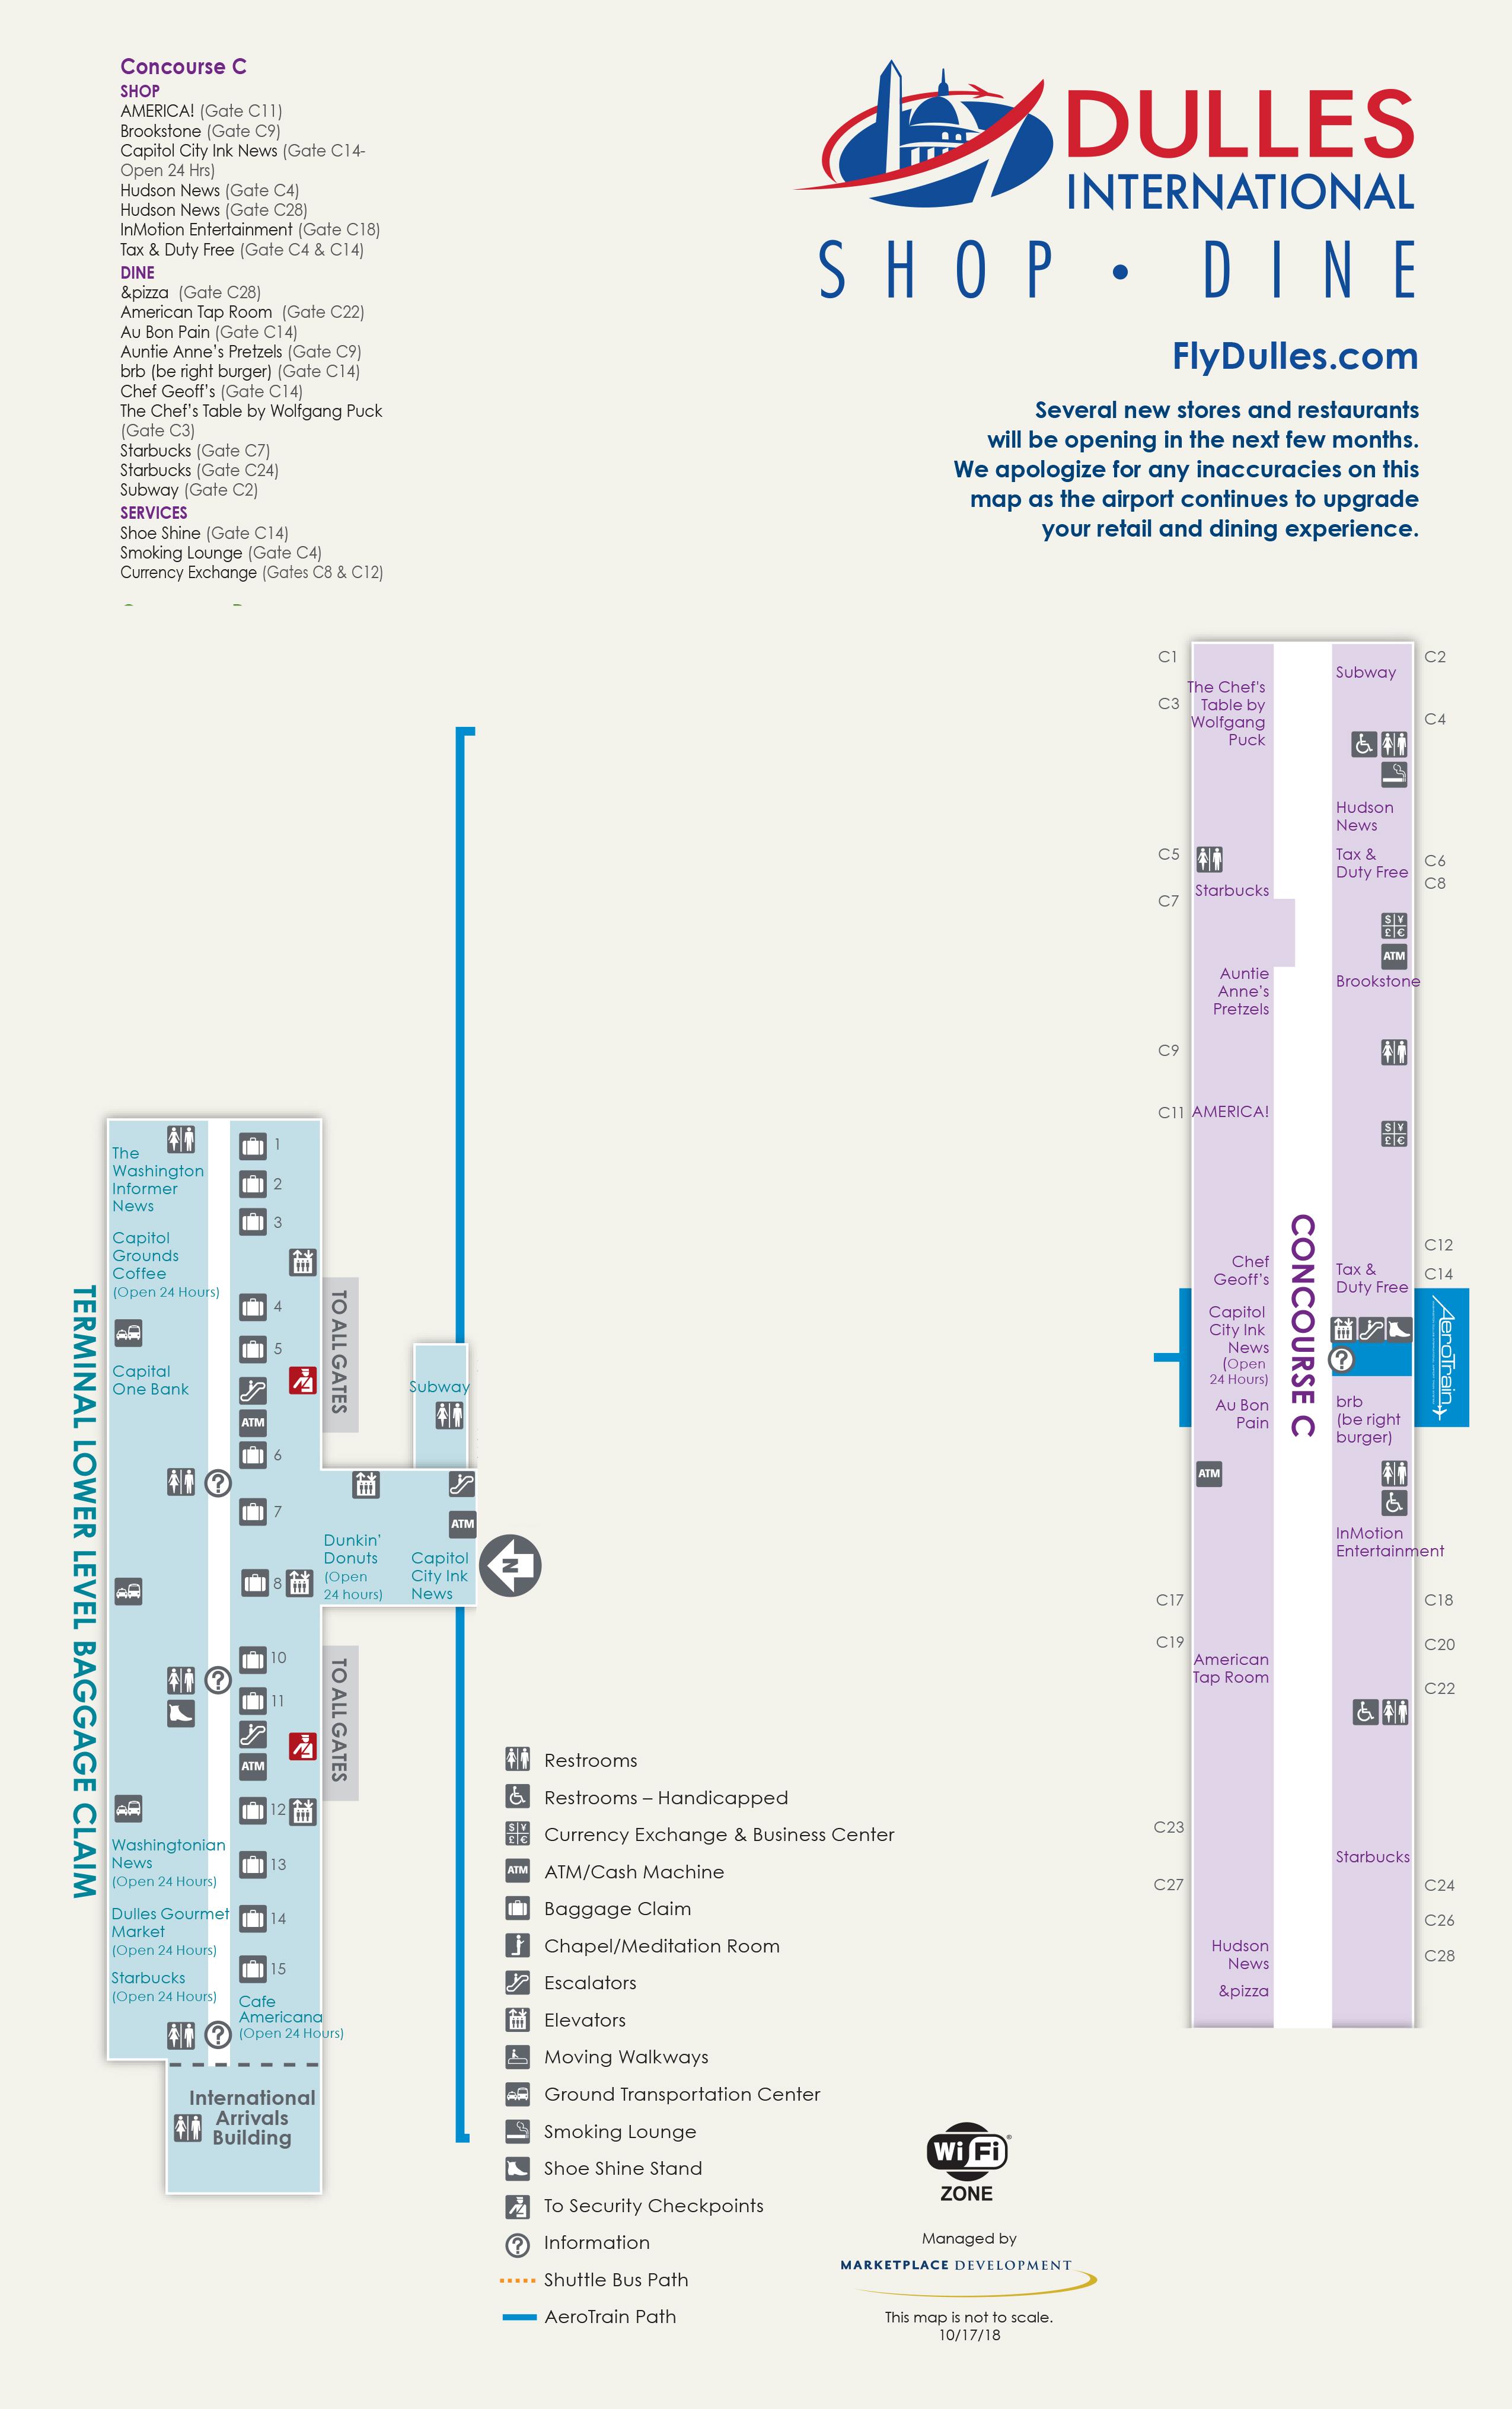 Dulles Airport Map (IAD) - Printable Terminal Maps, Shops ... on salt lake city terminal map, miami international terminal map, o'hare airport terminal map, sna terminal map, bos terminal map, mdw terminal map, phoenix terminal map, international airport terminal map, baltimore terminal map, pearson airport terminal map, logan terminal map, st. louis terminal map, lga terminal map, detroit airport terminal map, chicago terminal map, las vegas terminal map, rdu terminal map, united airlines terminal map, tpa terminal map, msp terminal map,